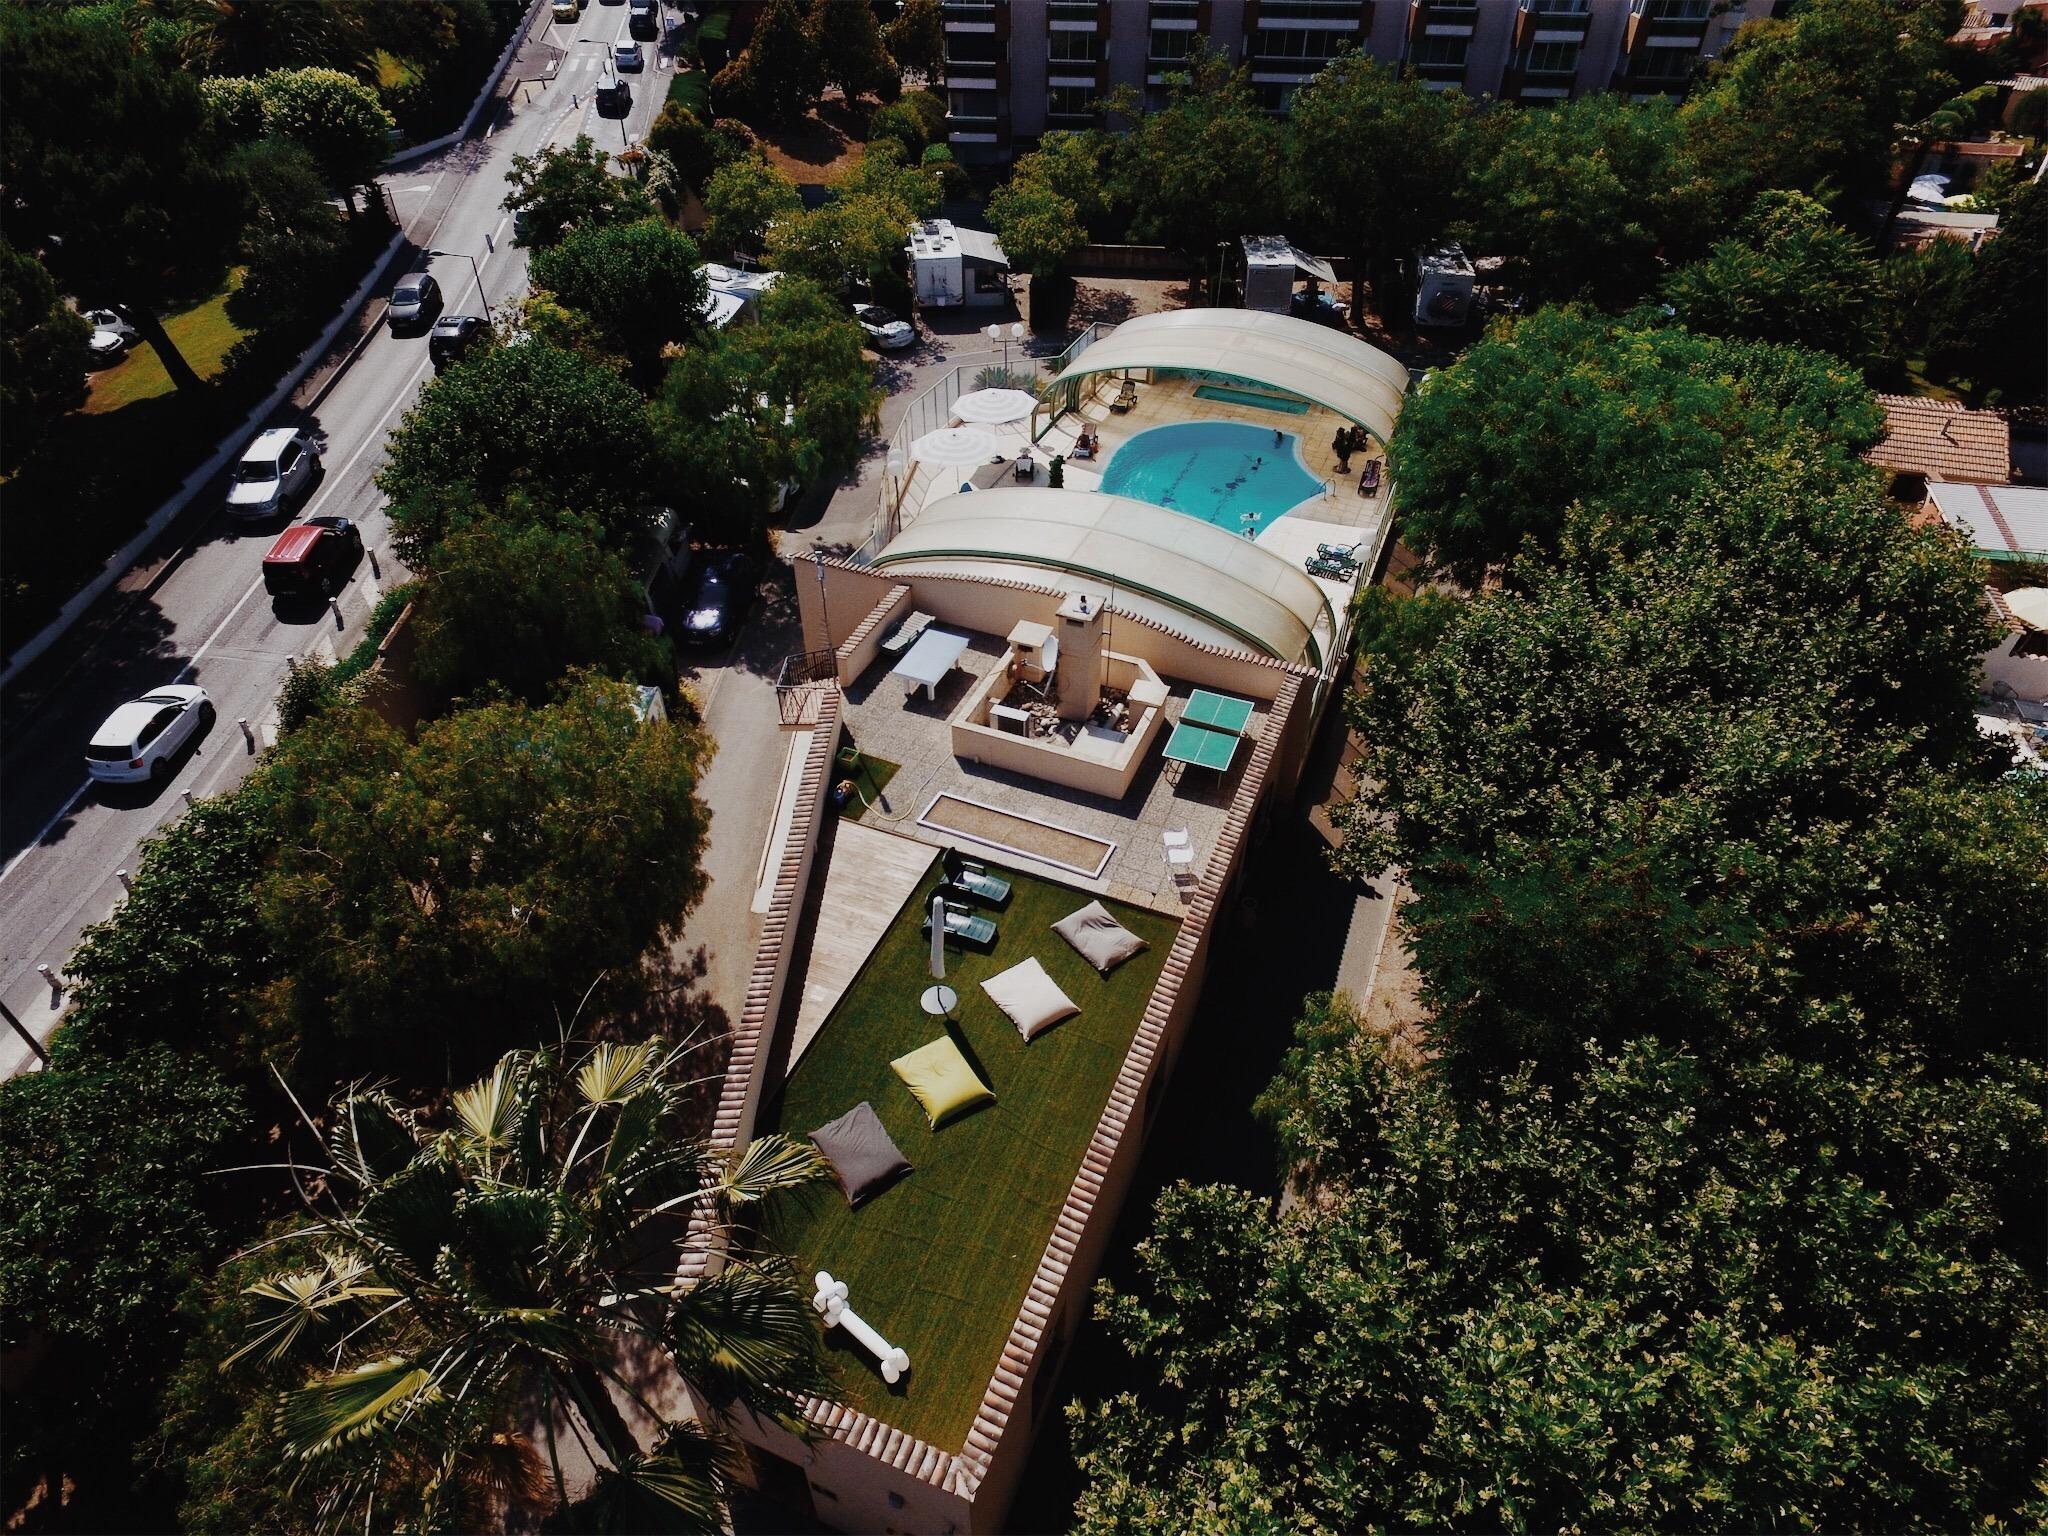 franzosisch-camping Camping de l'Hippodrome Villeneuve Loubet Plage